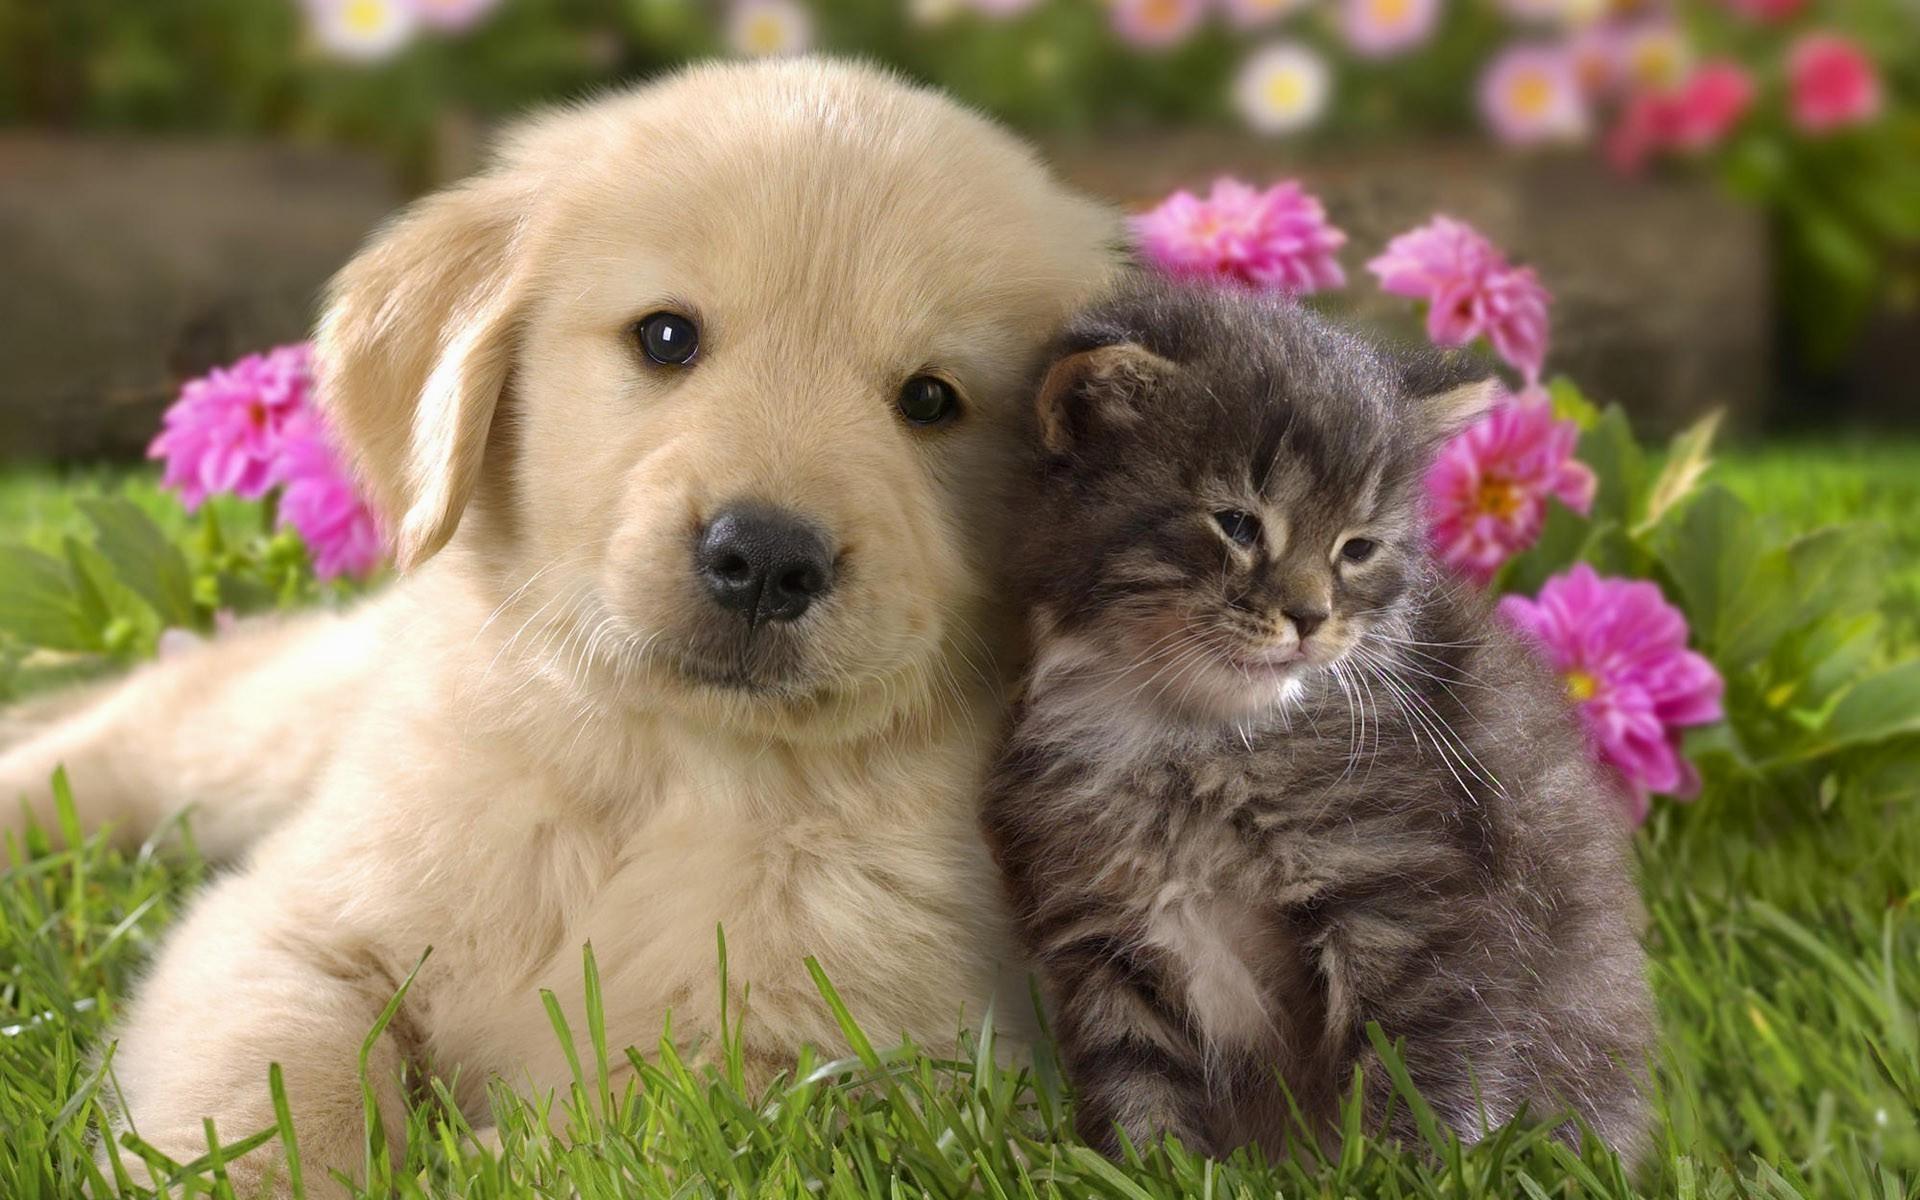 Cute-Dog-and-Cat-Wallpaper